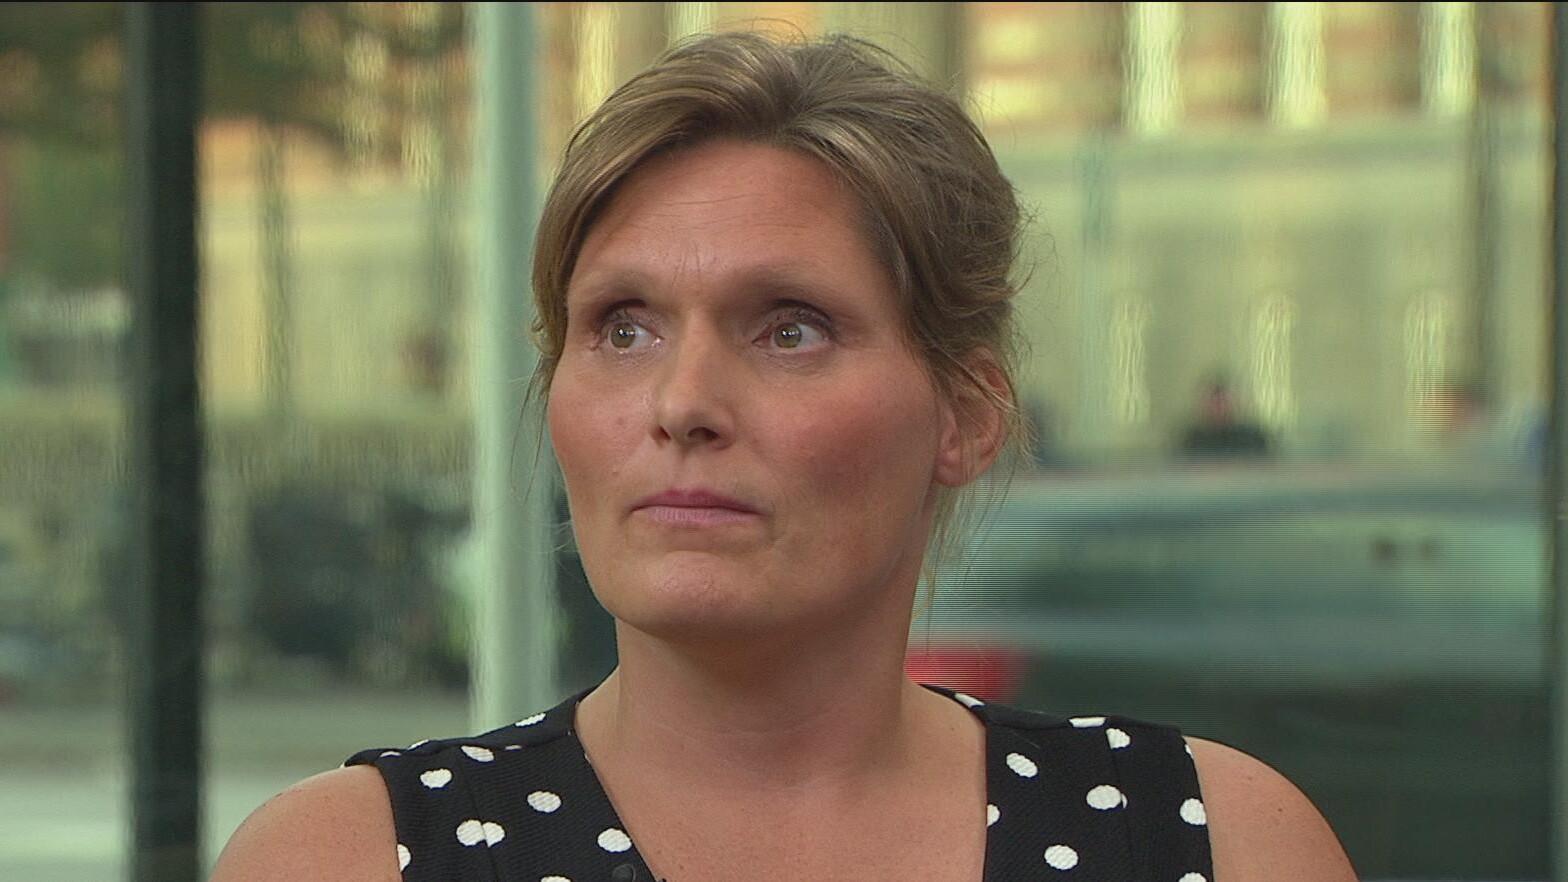 flirt dating site massagepiger esbjerg utro kvinder